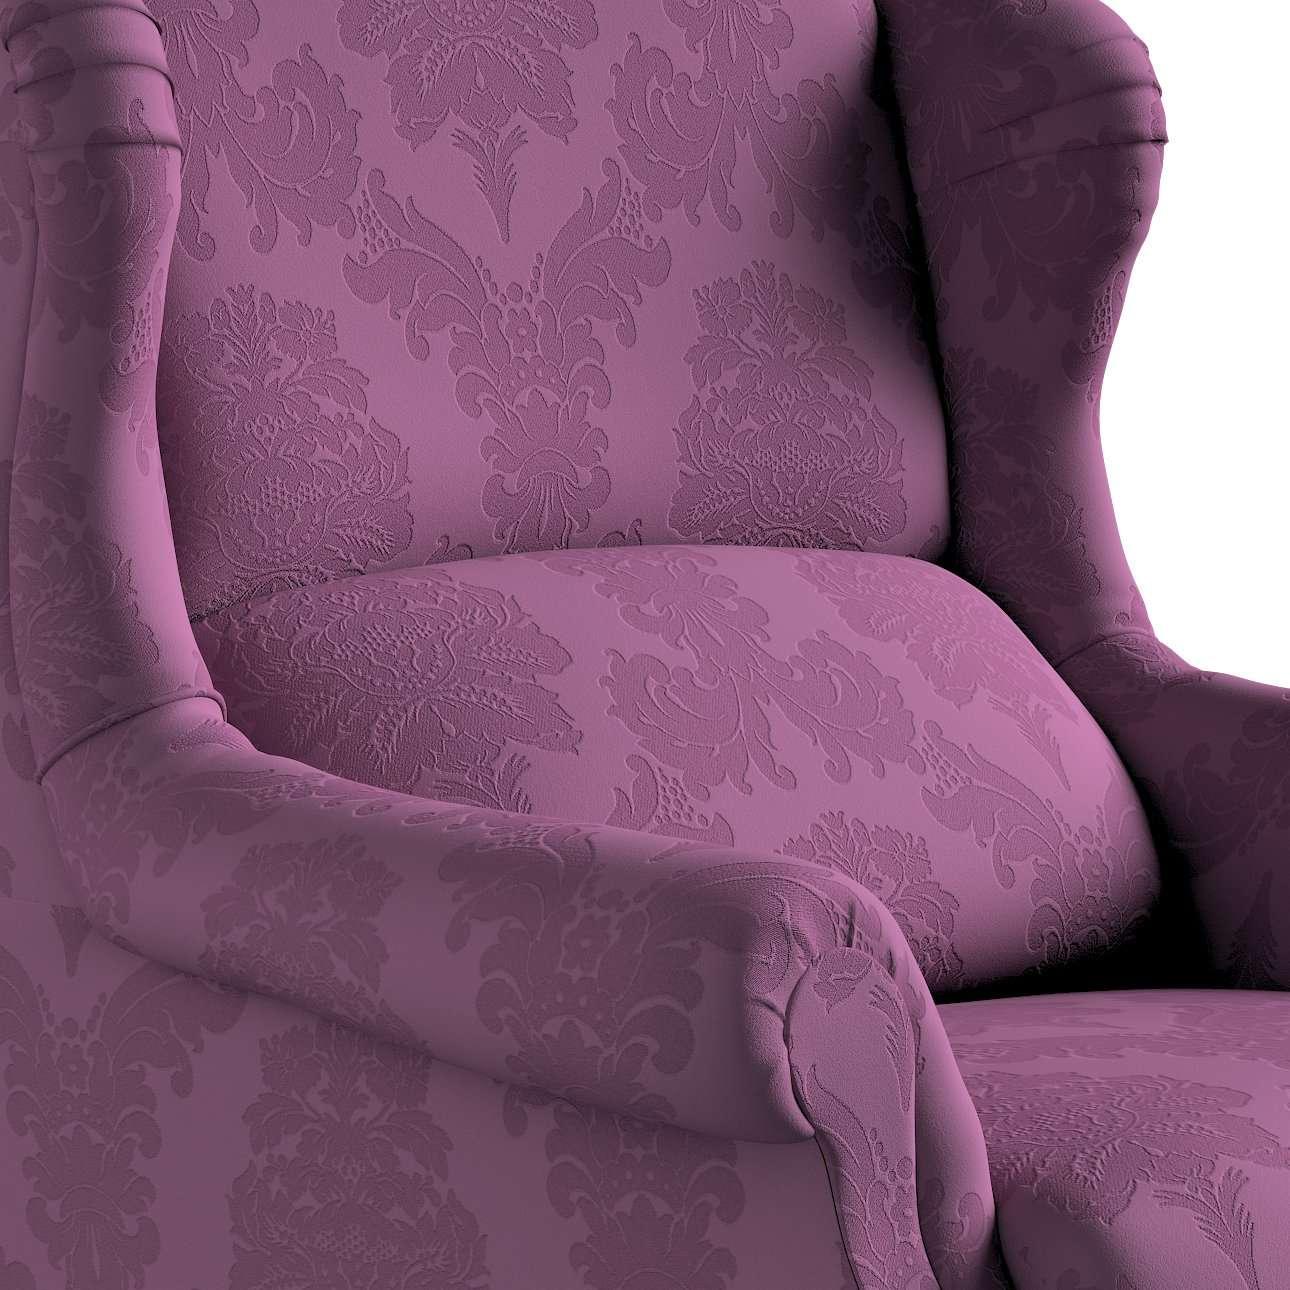 Fotel Unique w kolekcji Damasco, tkanina: 613-75